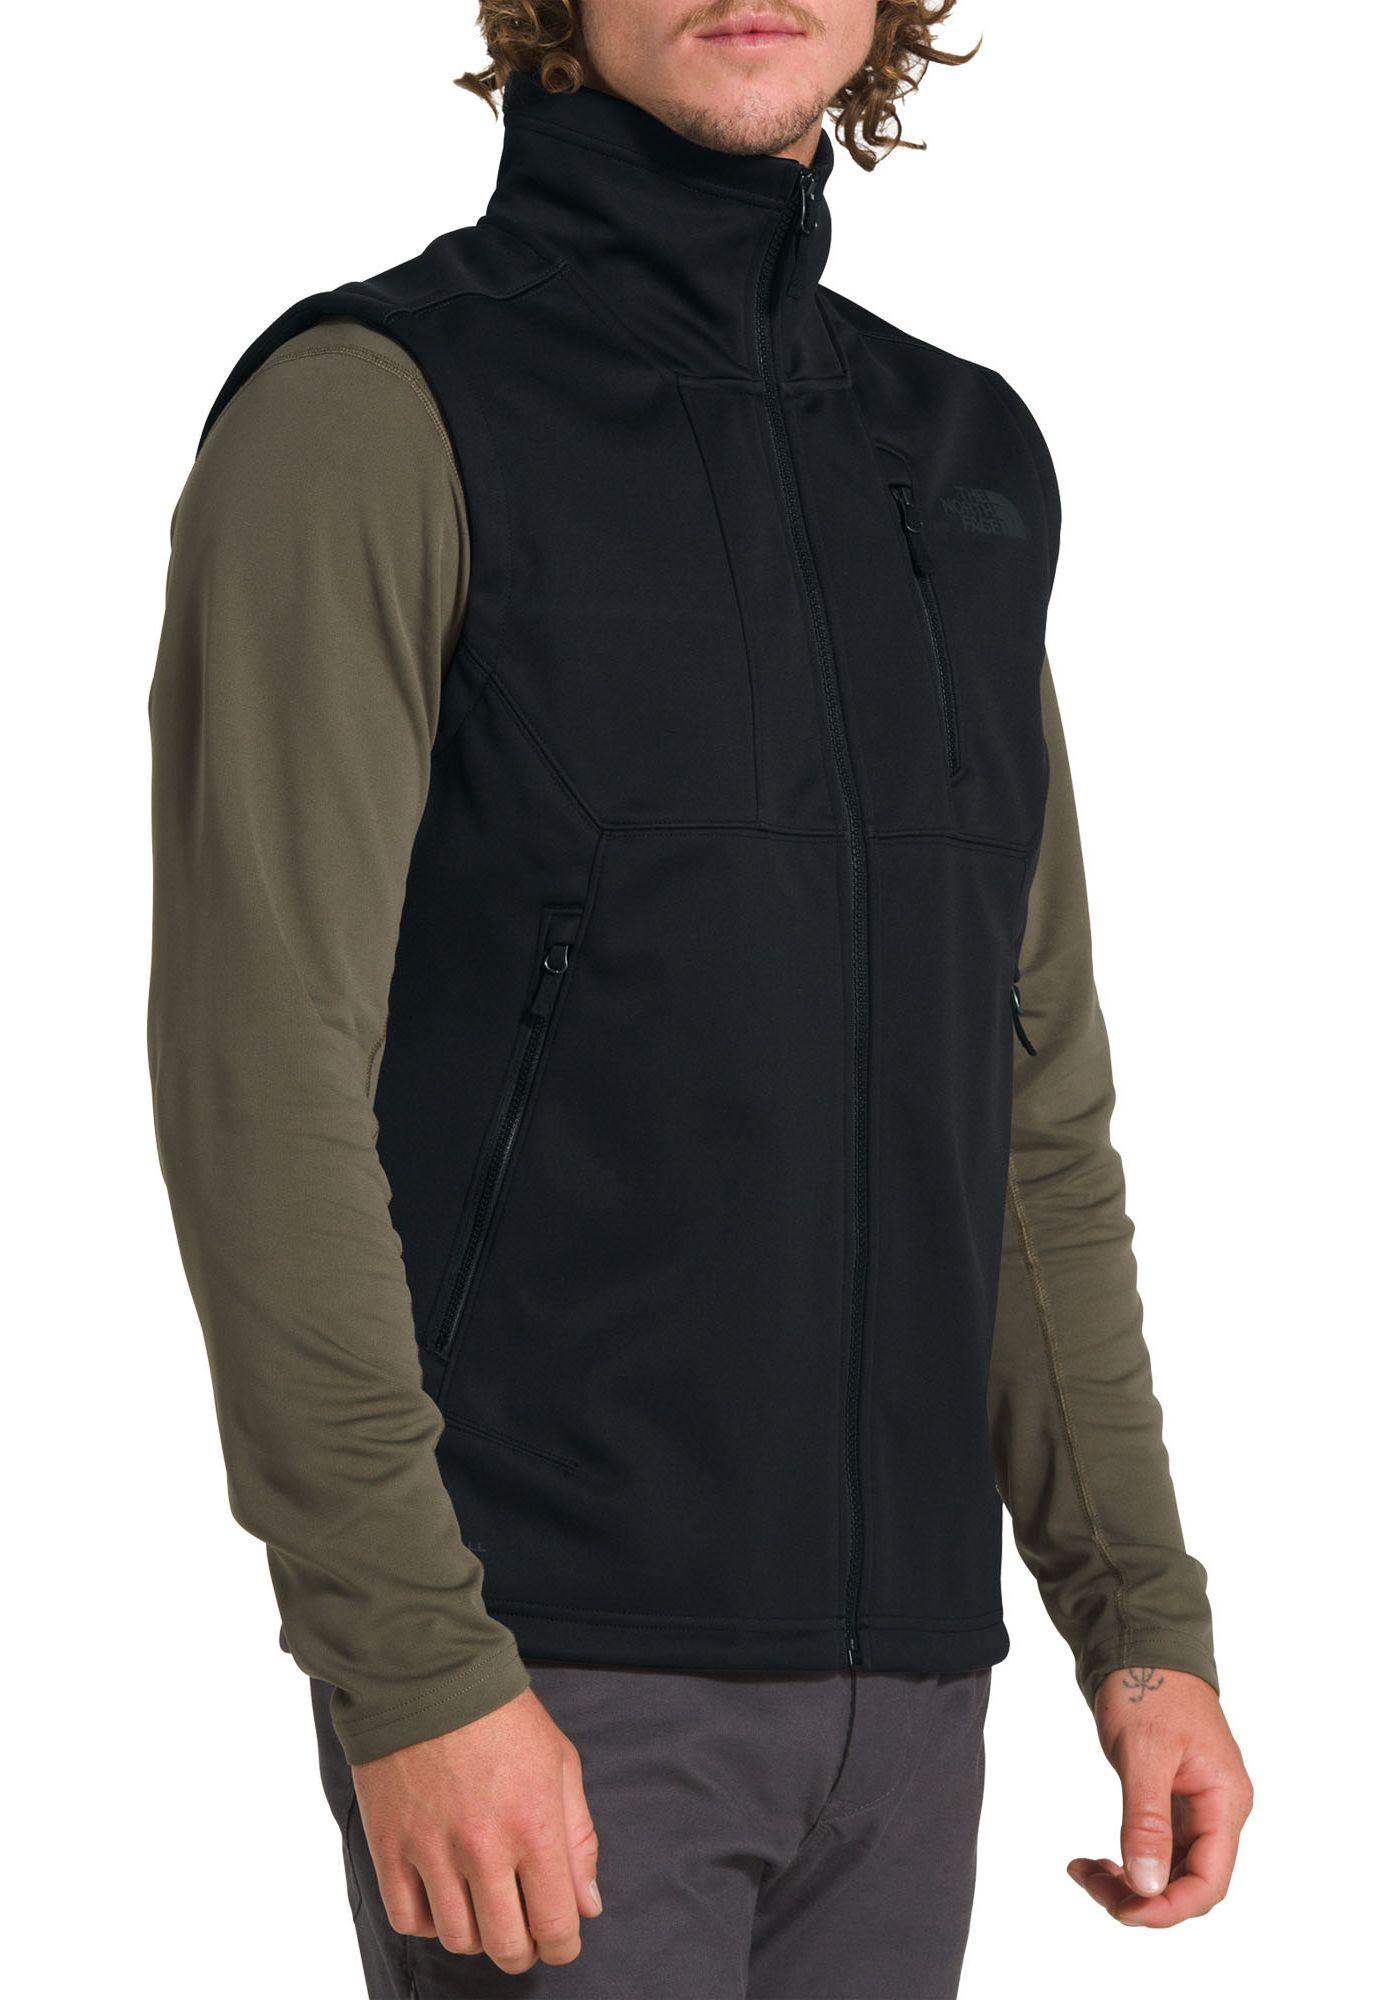 The North Face Men's Apex Risor Soft Shell Vest